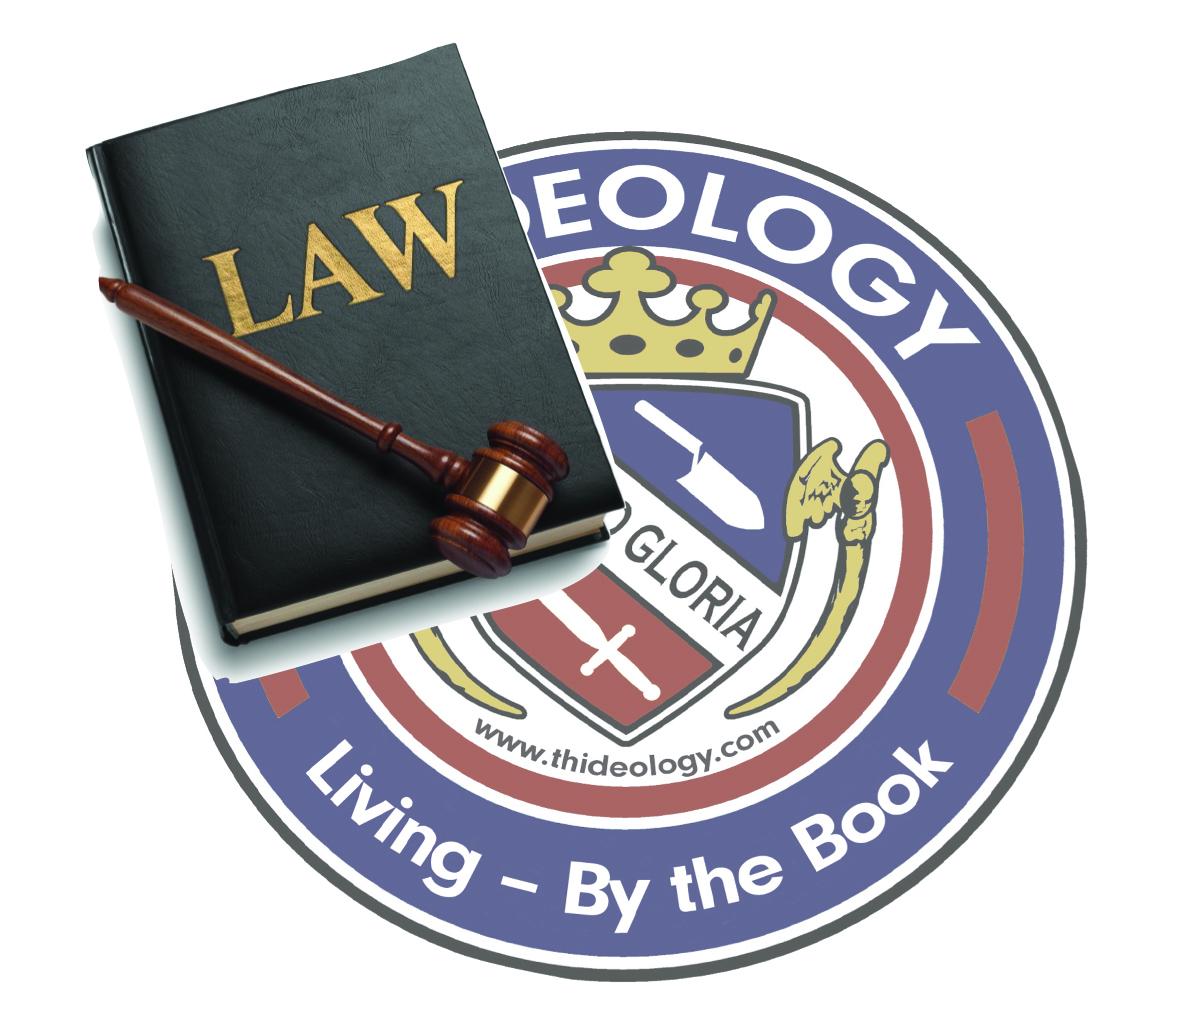 lawbookgavel